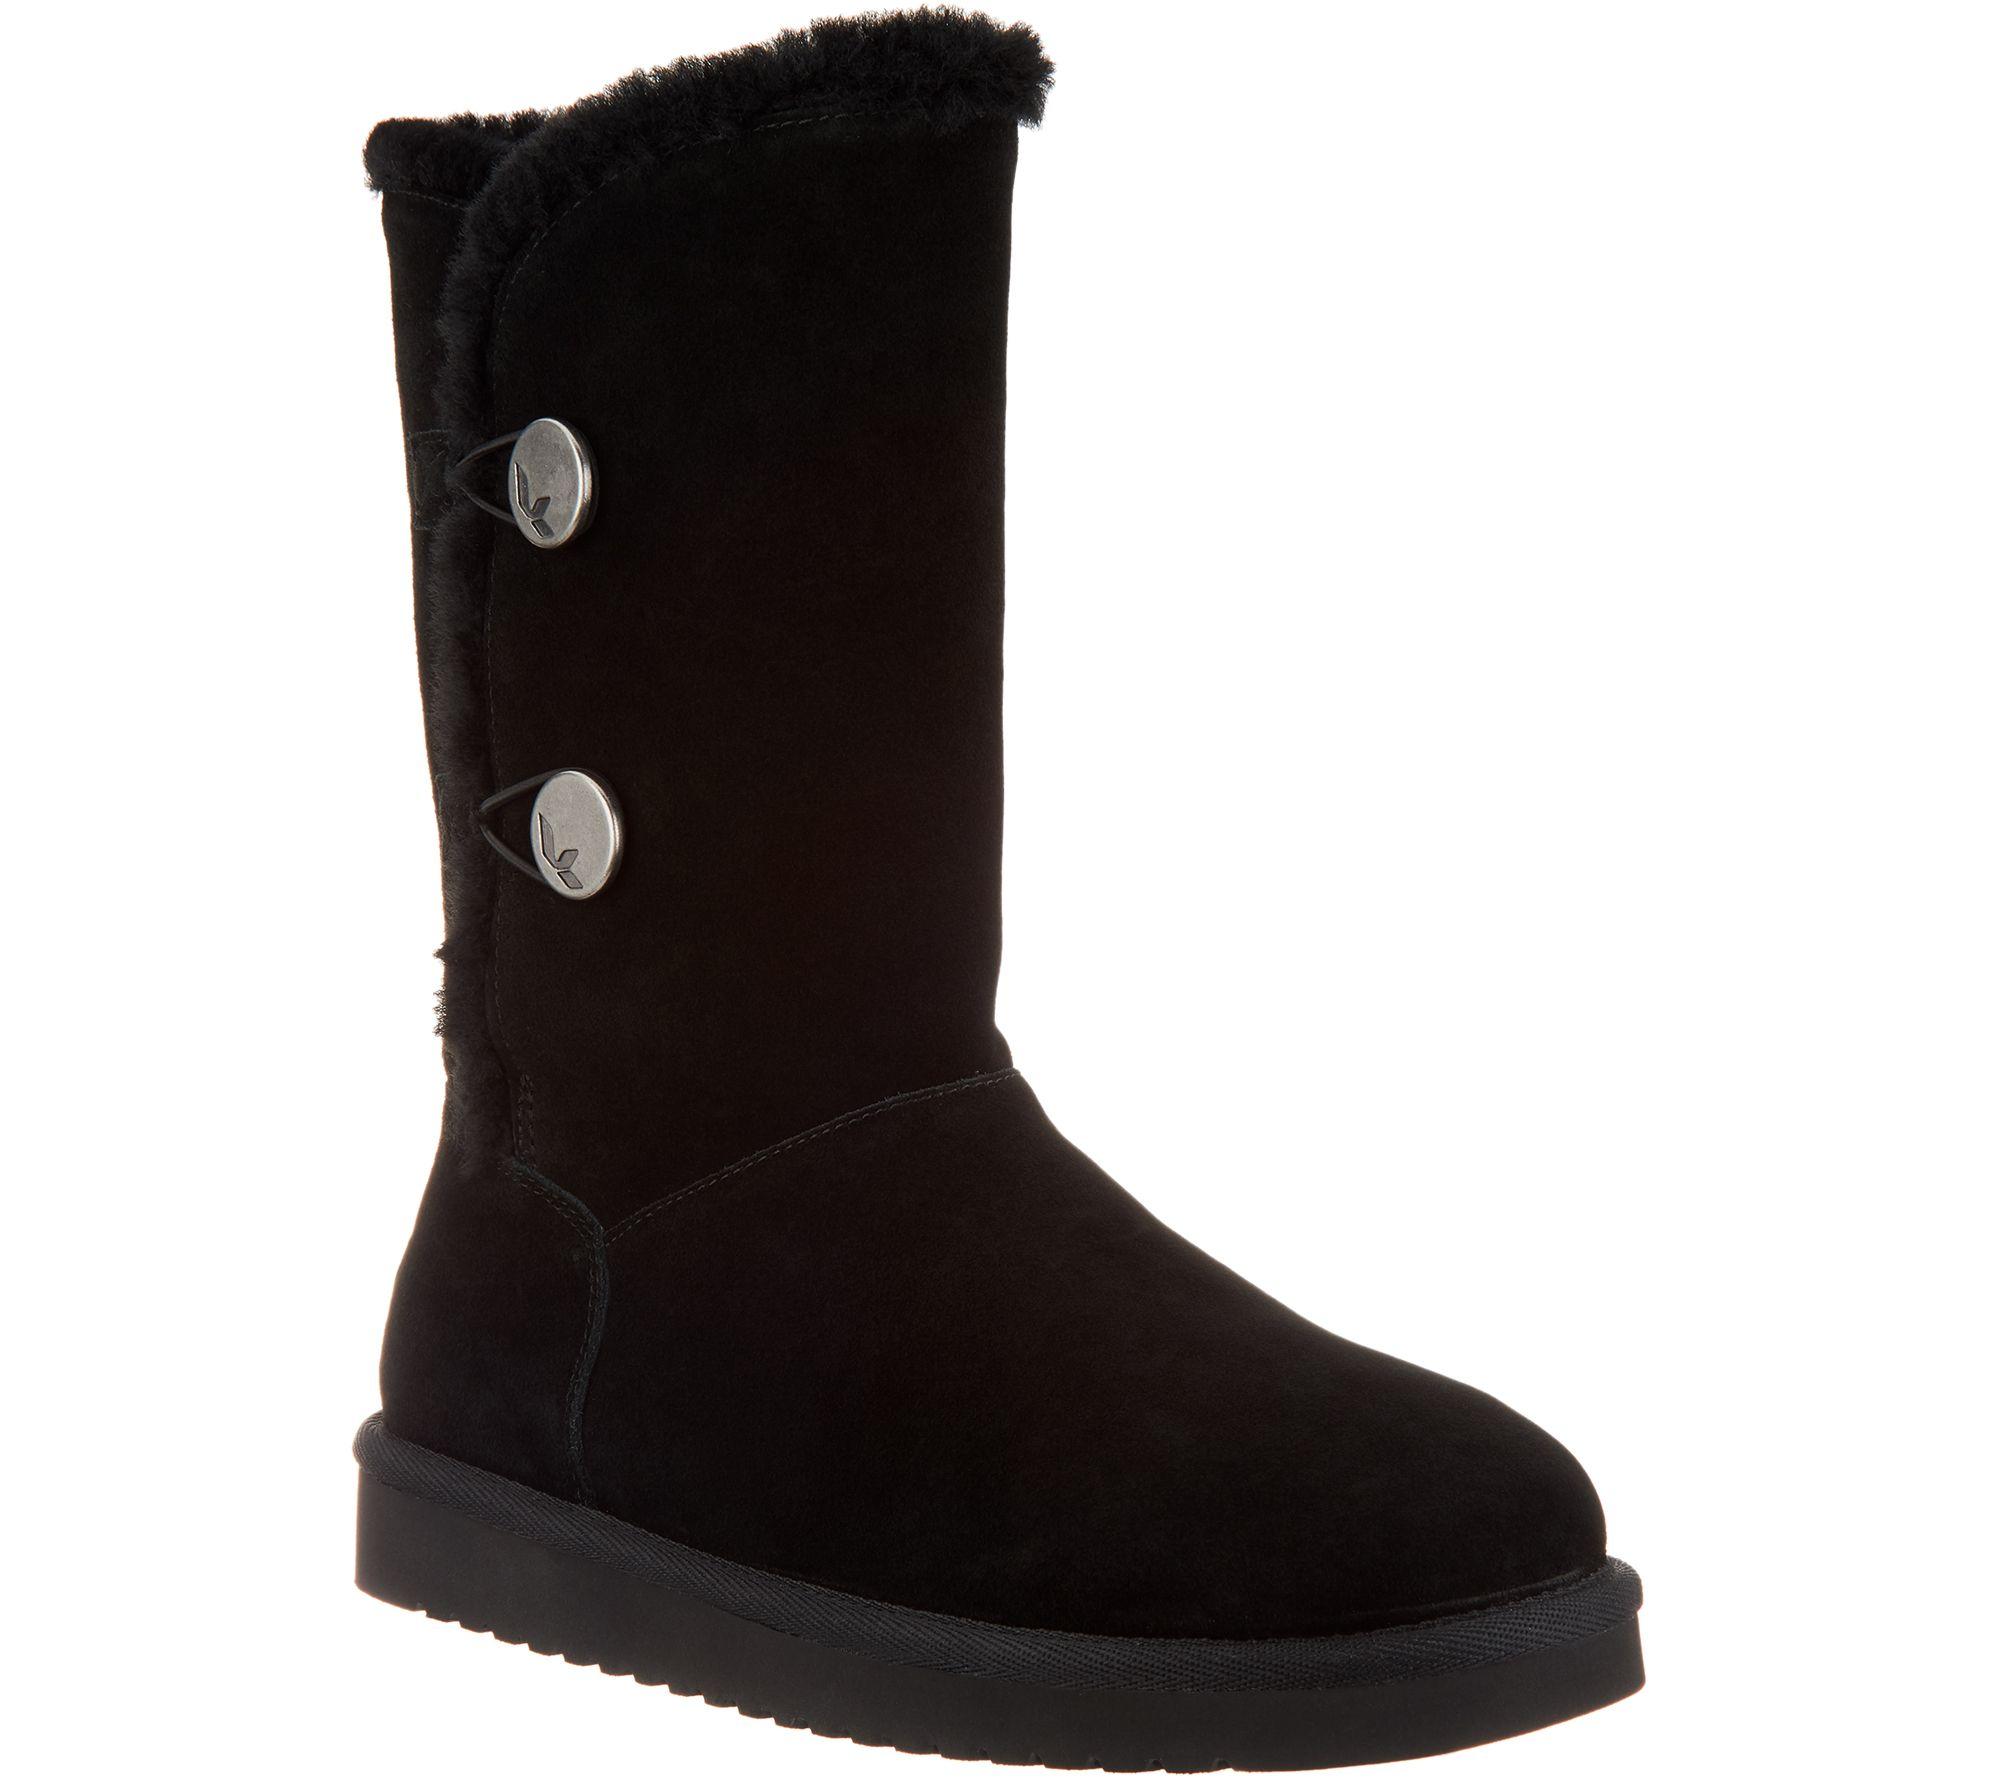 04eeda3478e Koolaburra by UGG Suede Button Tall Boots - Kinslei - Page 1 — QVC.com